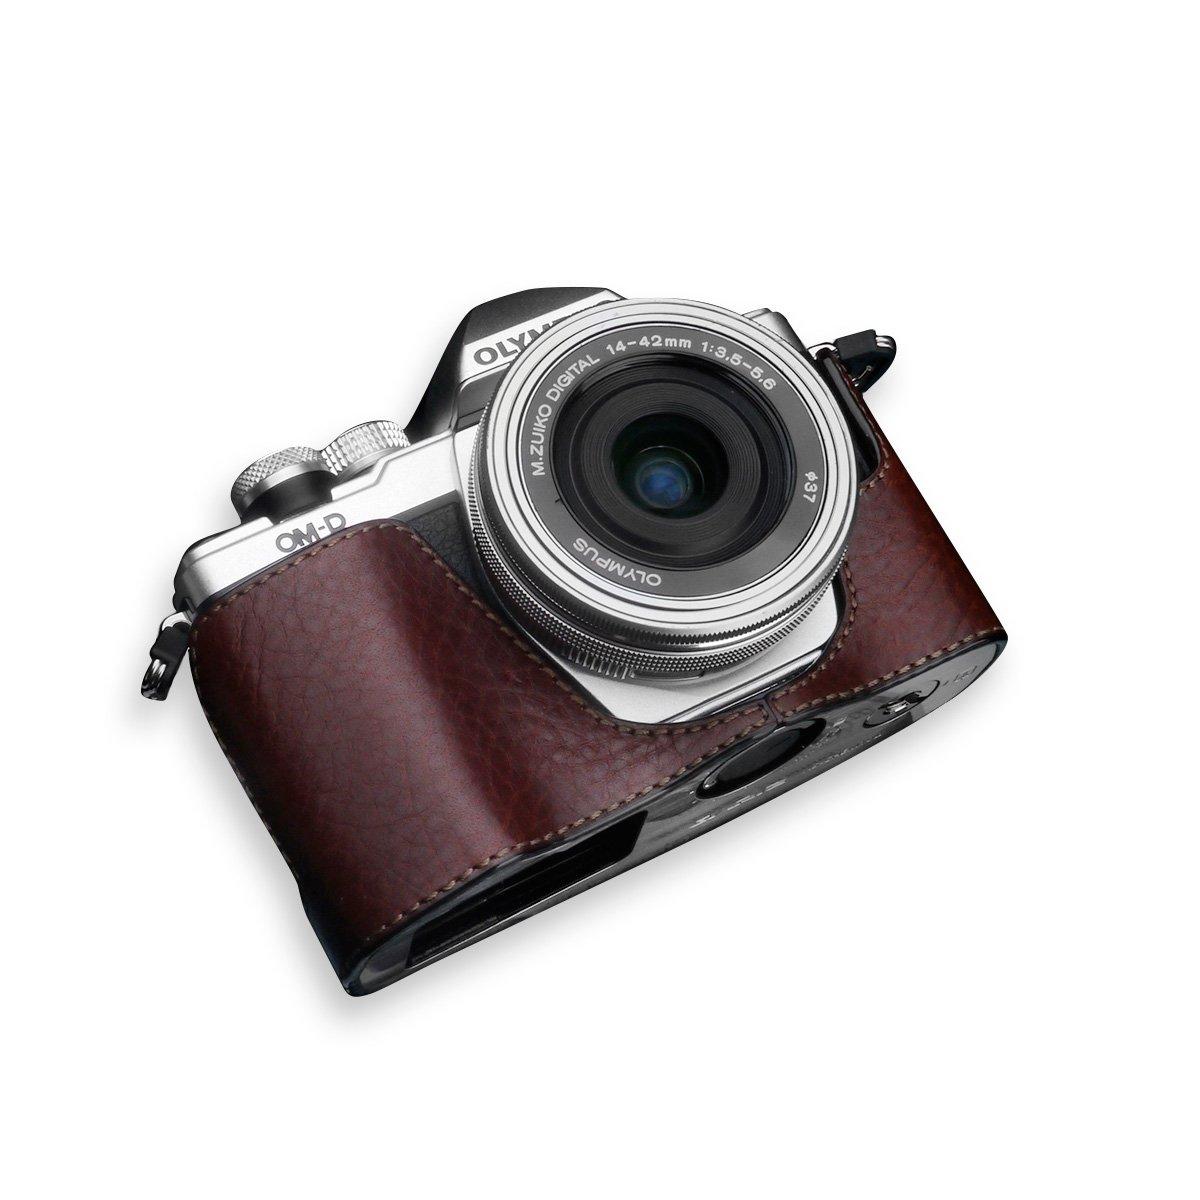 GARIZ OLYMPUS OM-D E-M10 Mark2用 本革カメラケース XS-CHEM10IIBR ブラウン B01D4MZZZ0 ブラウン